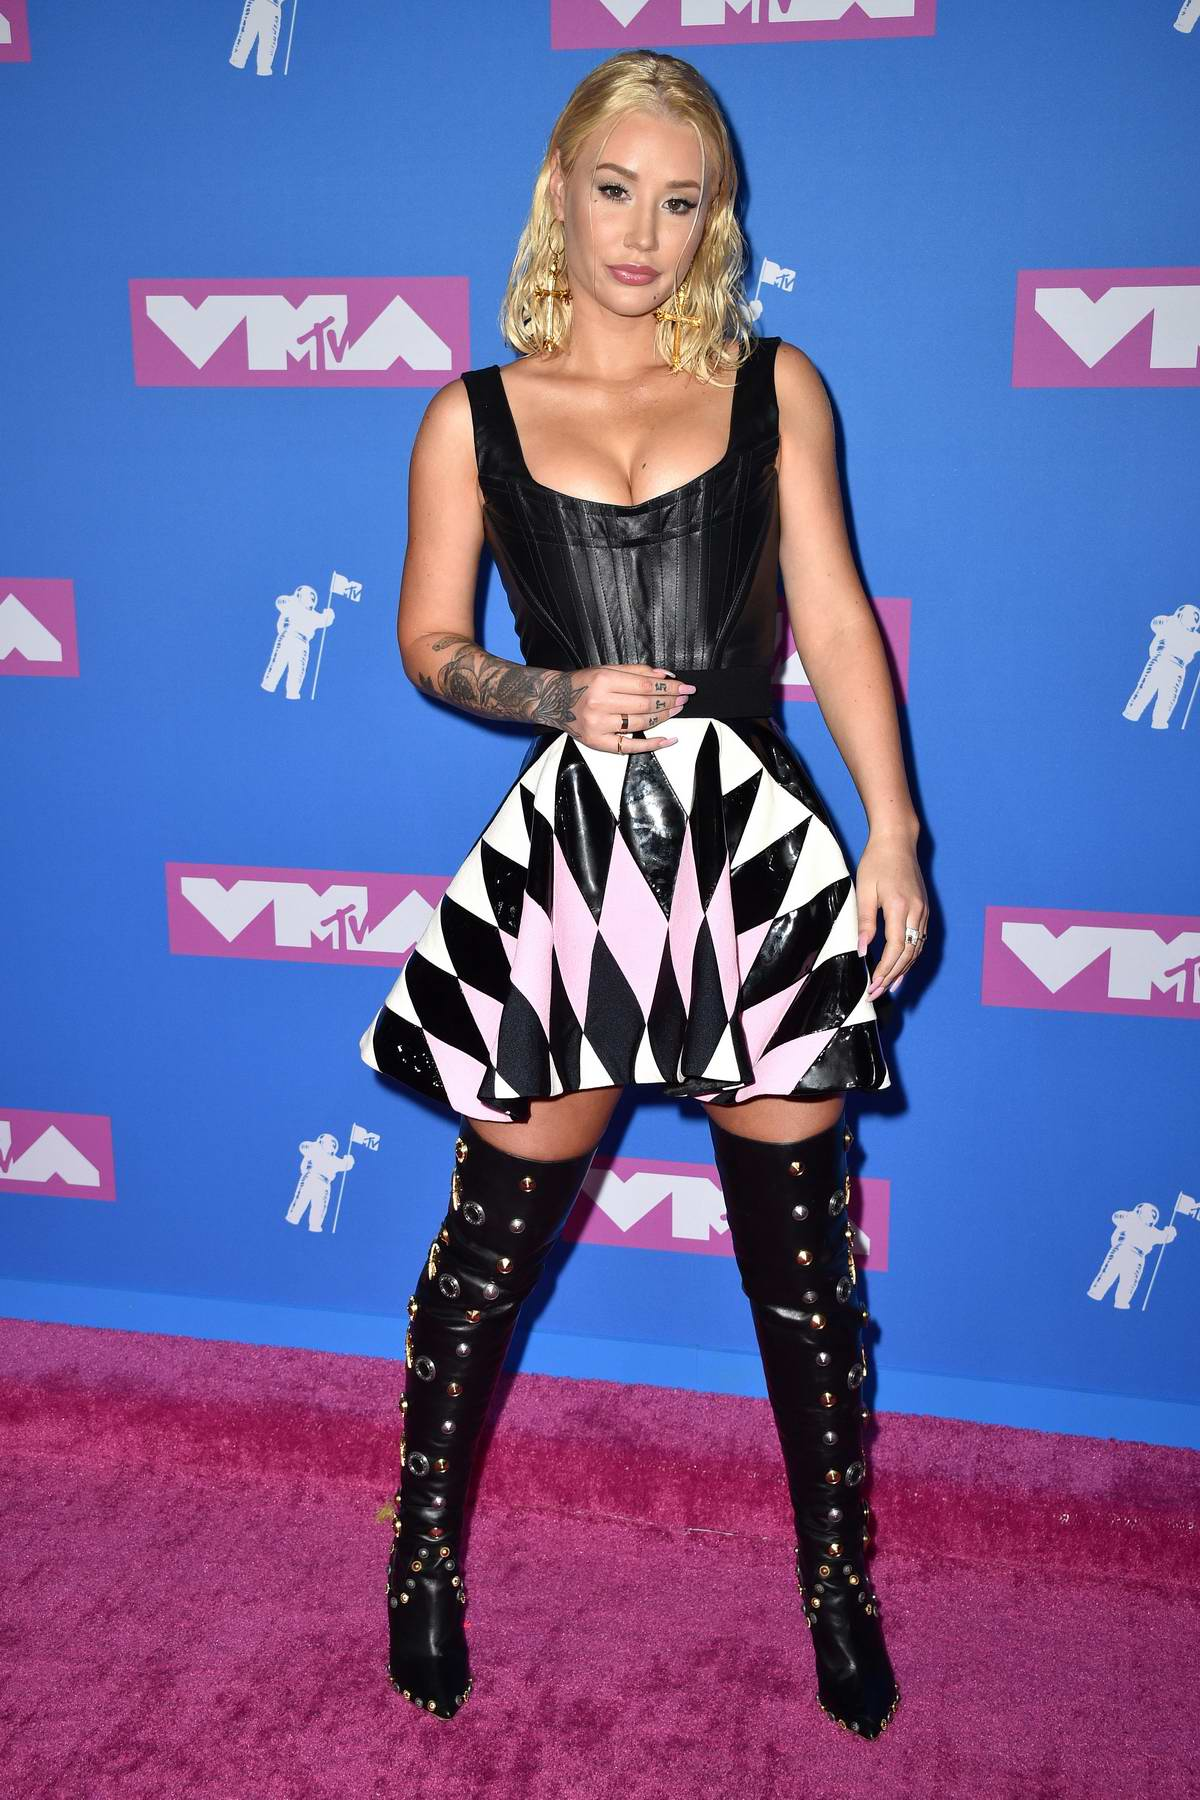 Iggy Azalea attends 2018 MTV Video Music Awards (MTV VMA 2018) at Radio City Music Hall in New York City